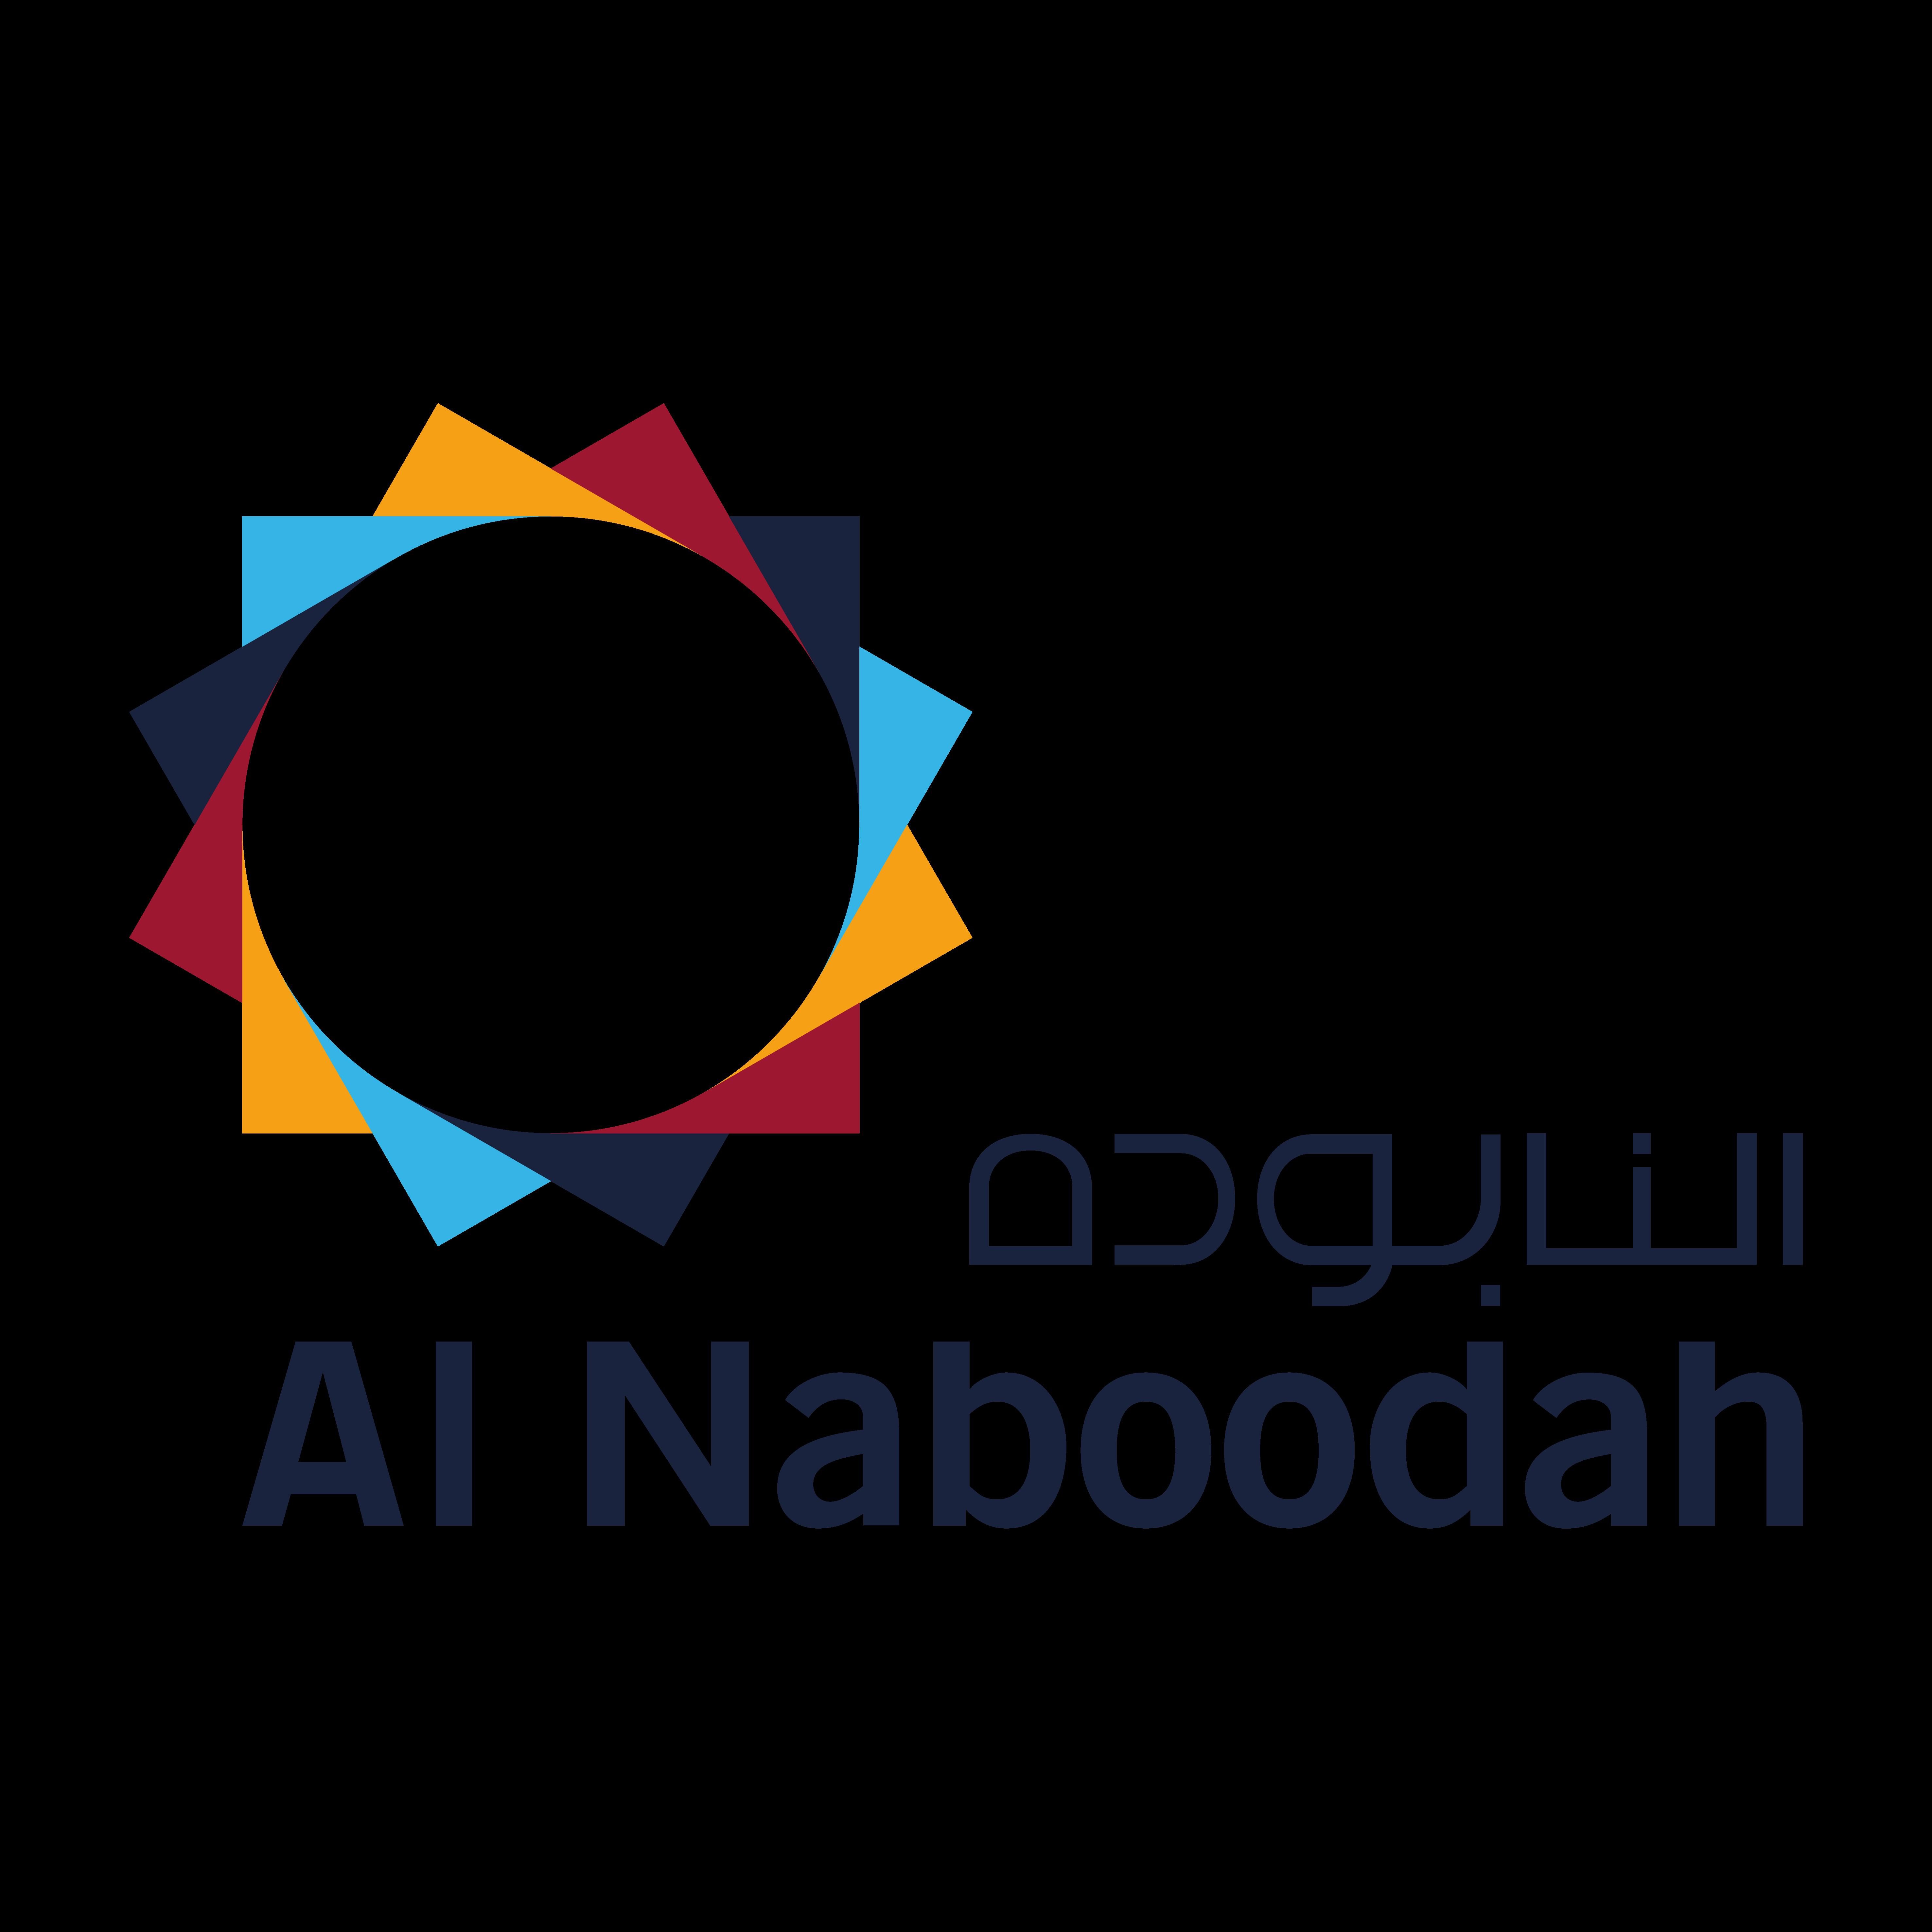 nawatt_clients_logos-04